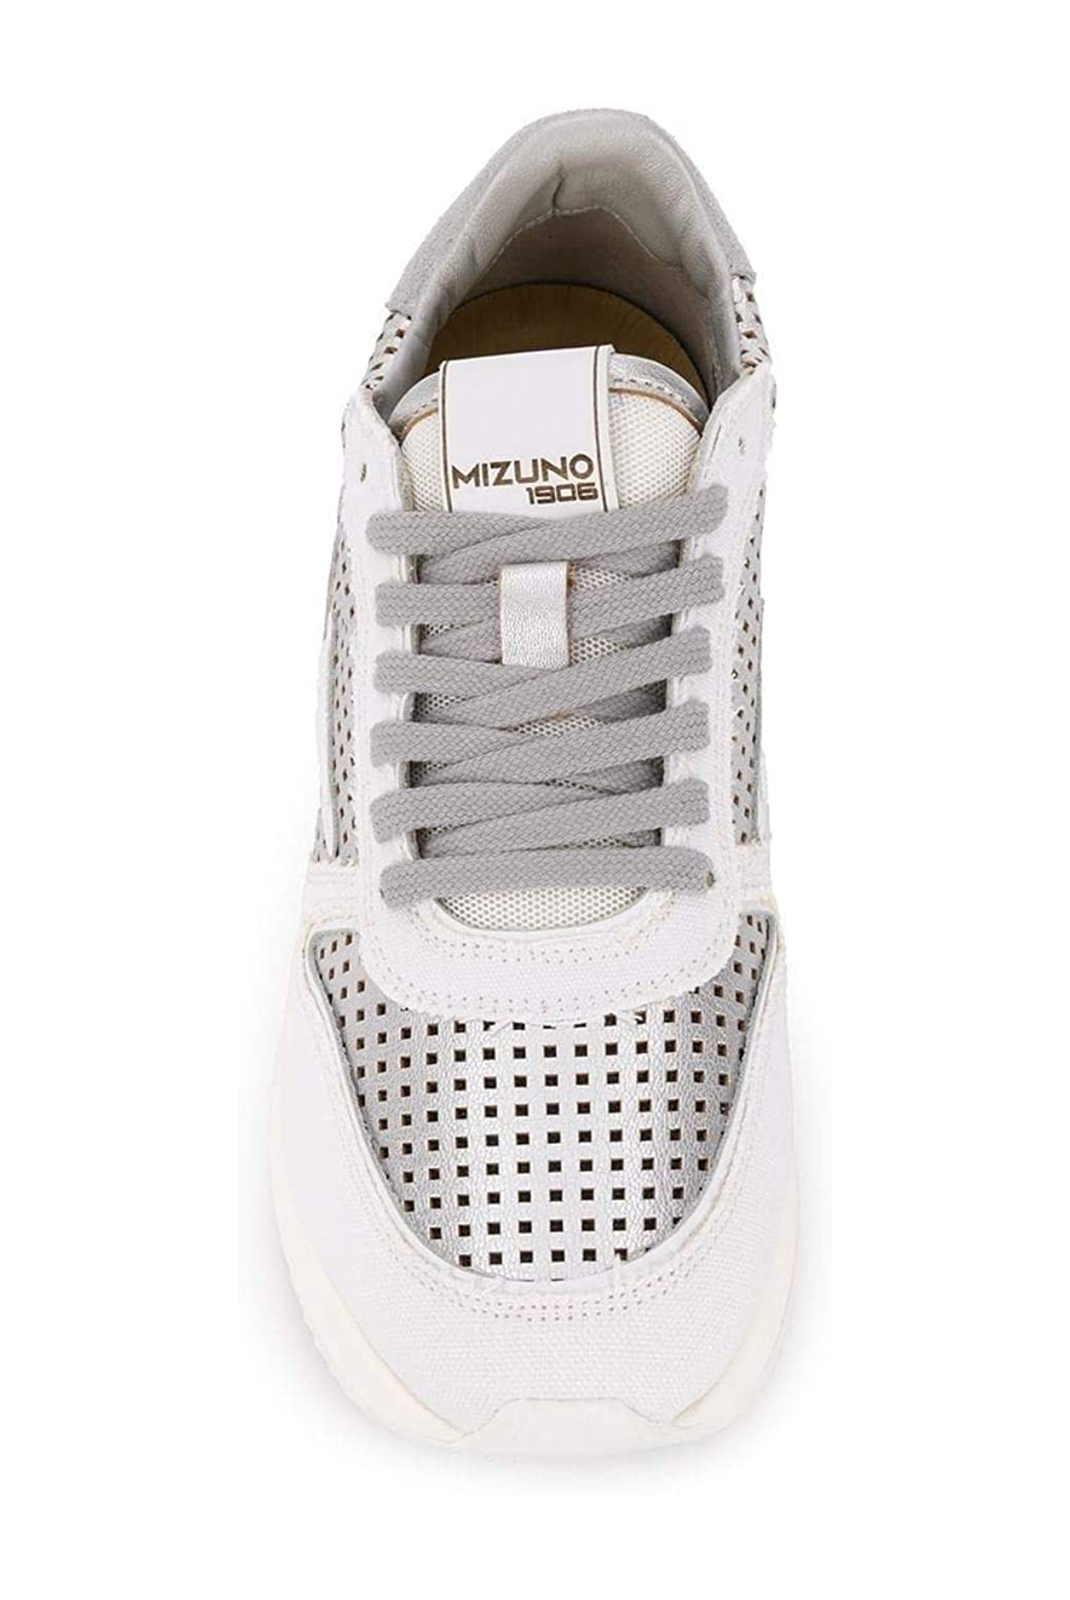 Chaussures   Mizuno D1GC196003 ETAMIN  SILVER/GREY/W